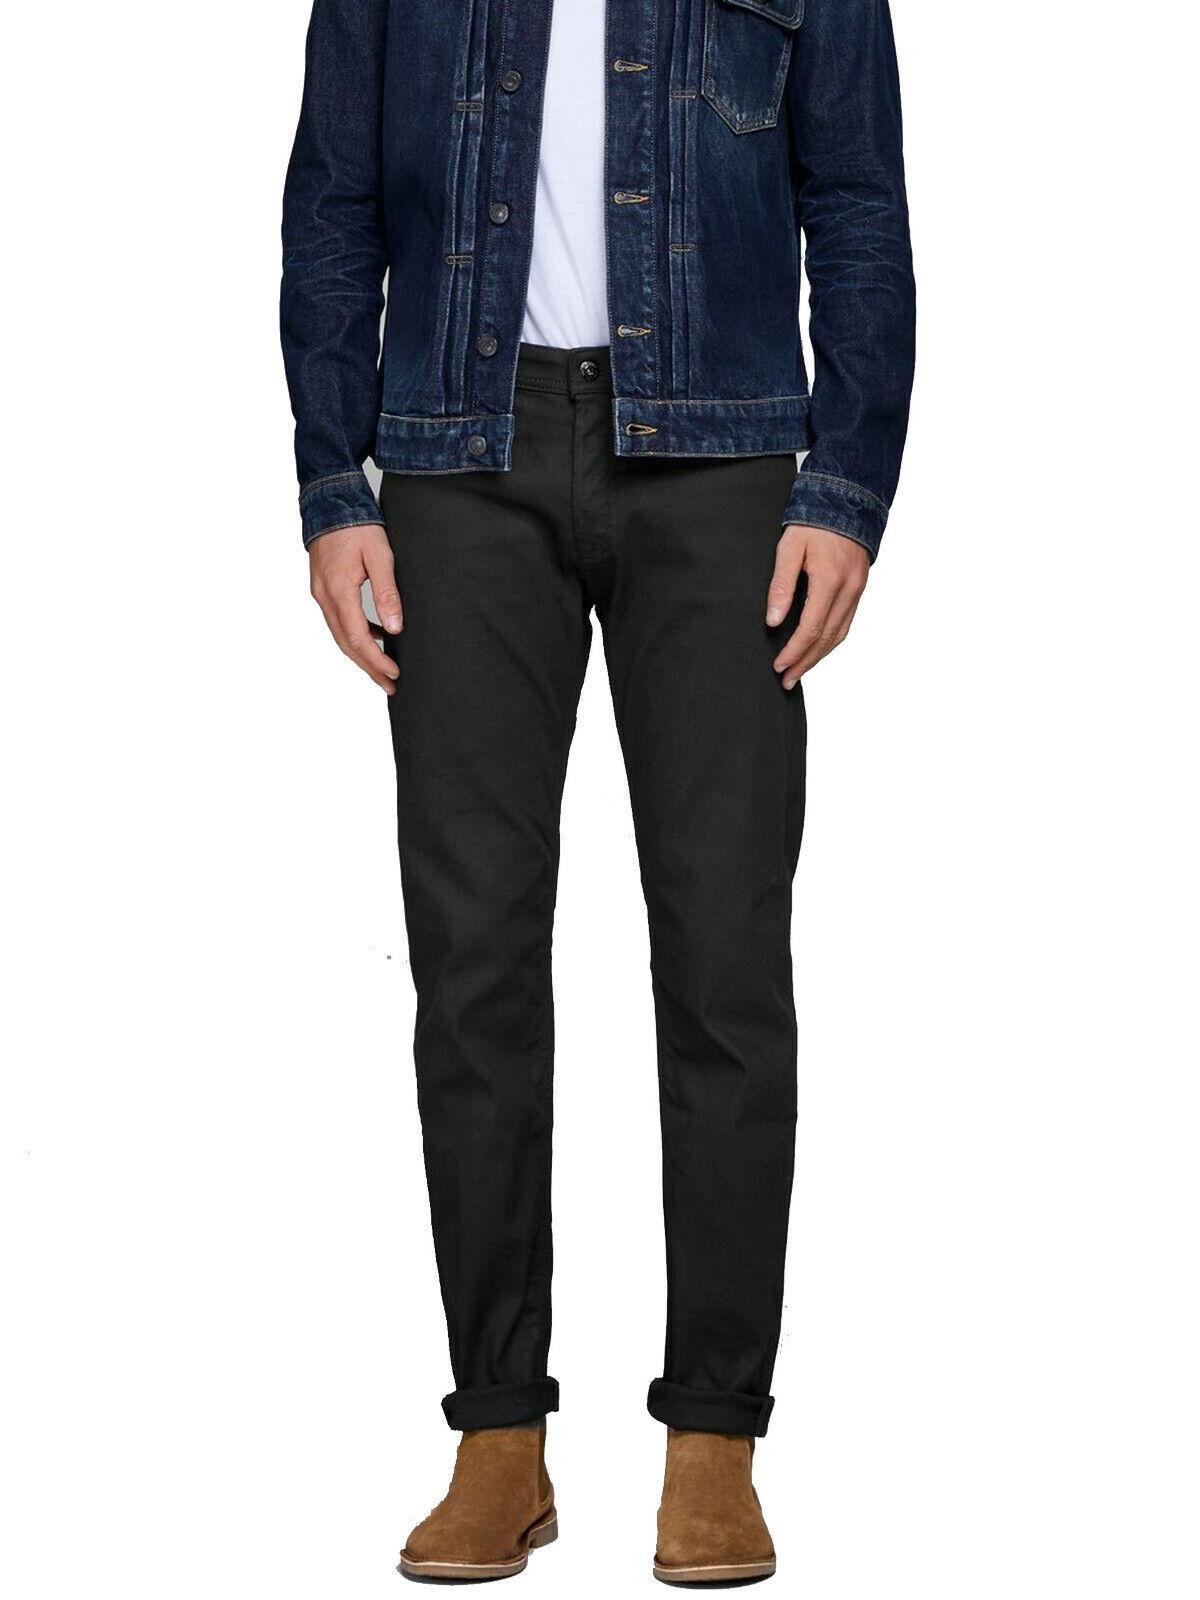 Jack Jack Jack & Jones Mike Original am 776 Comfort Fit Denim Jeans schwarz Pants 023aa2